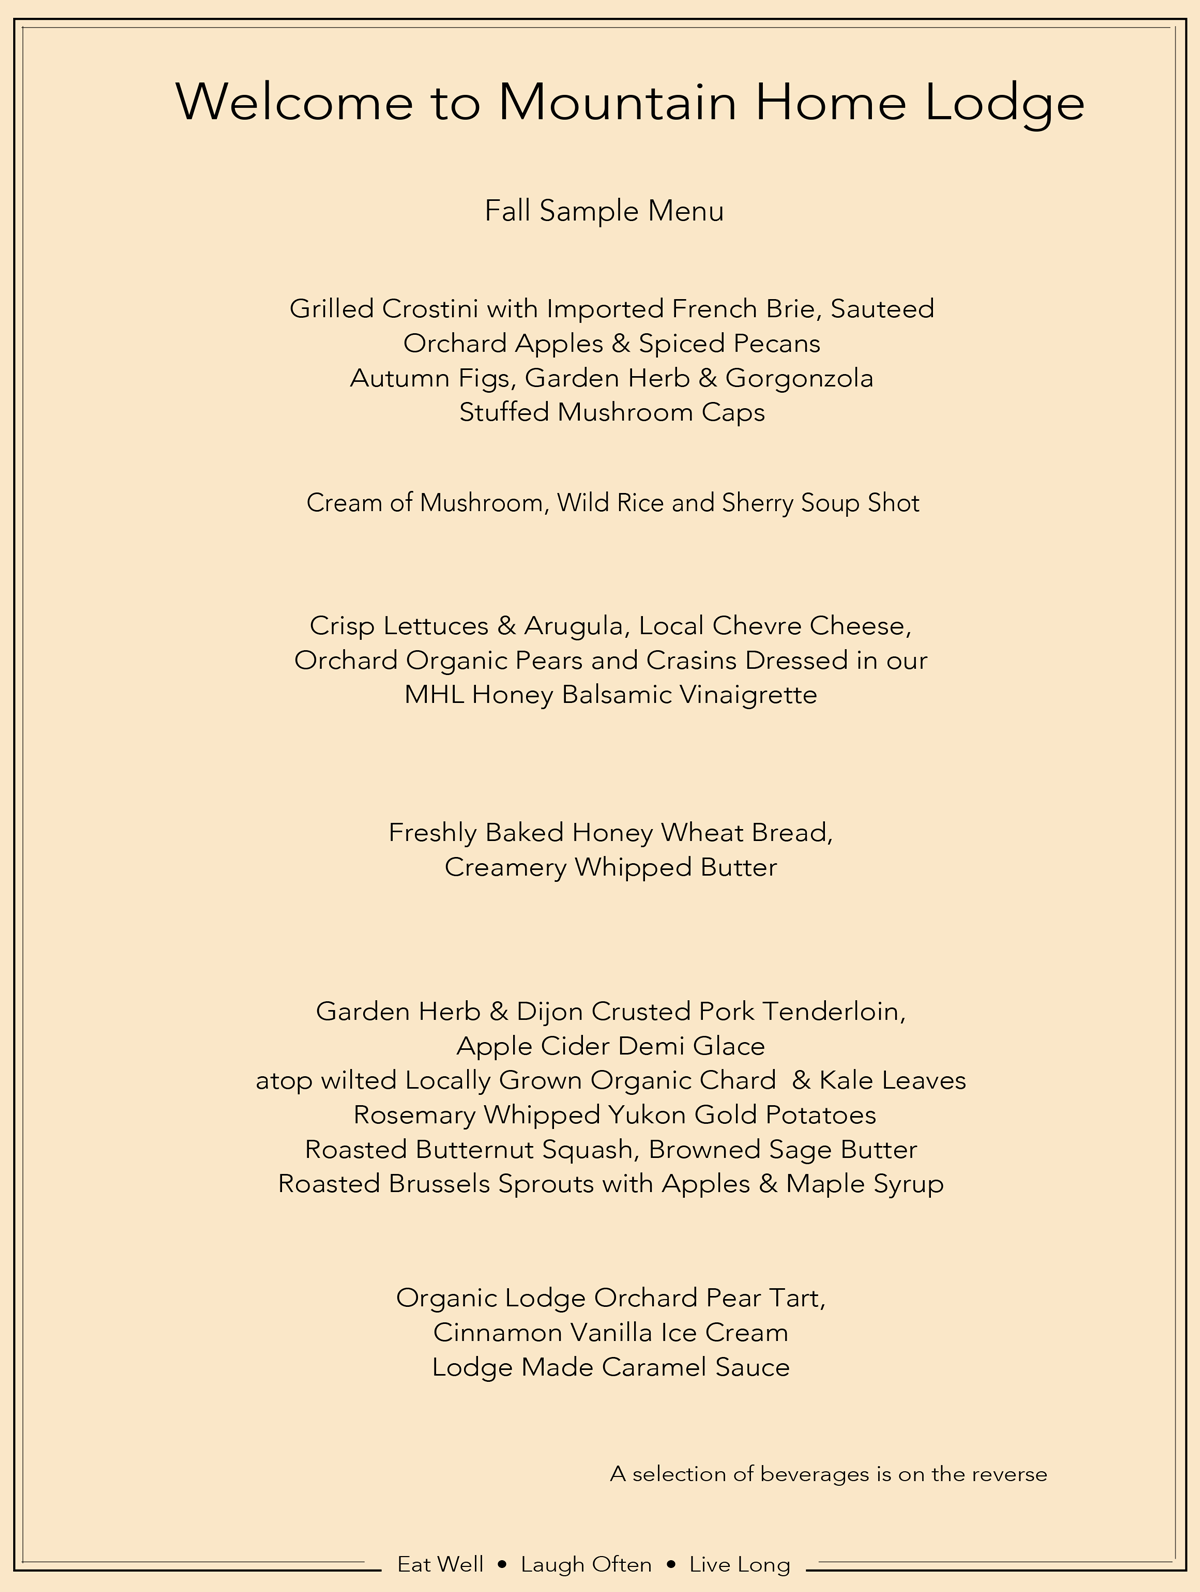 mountain home lodge menu images - Maple Garden Menu